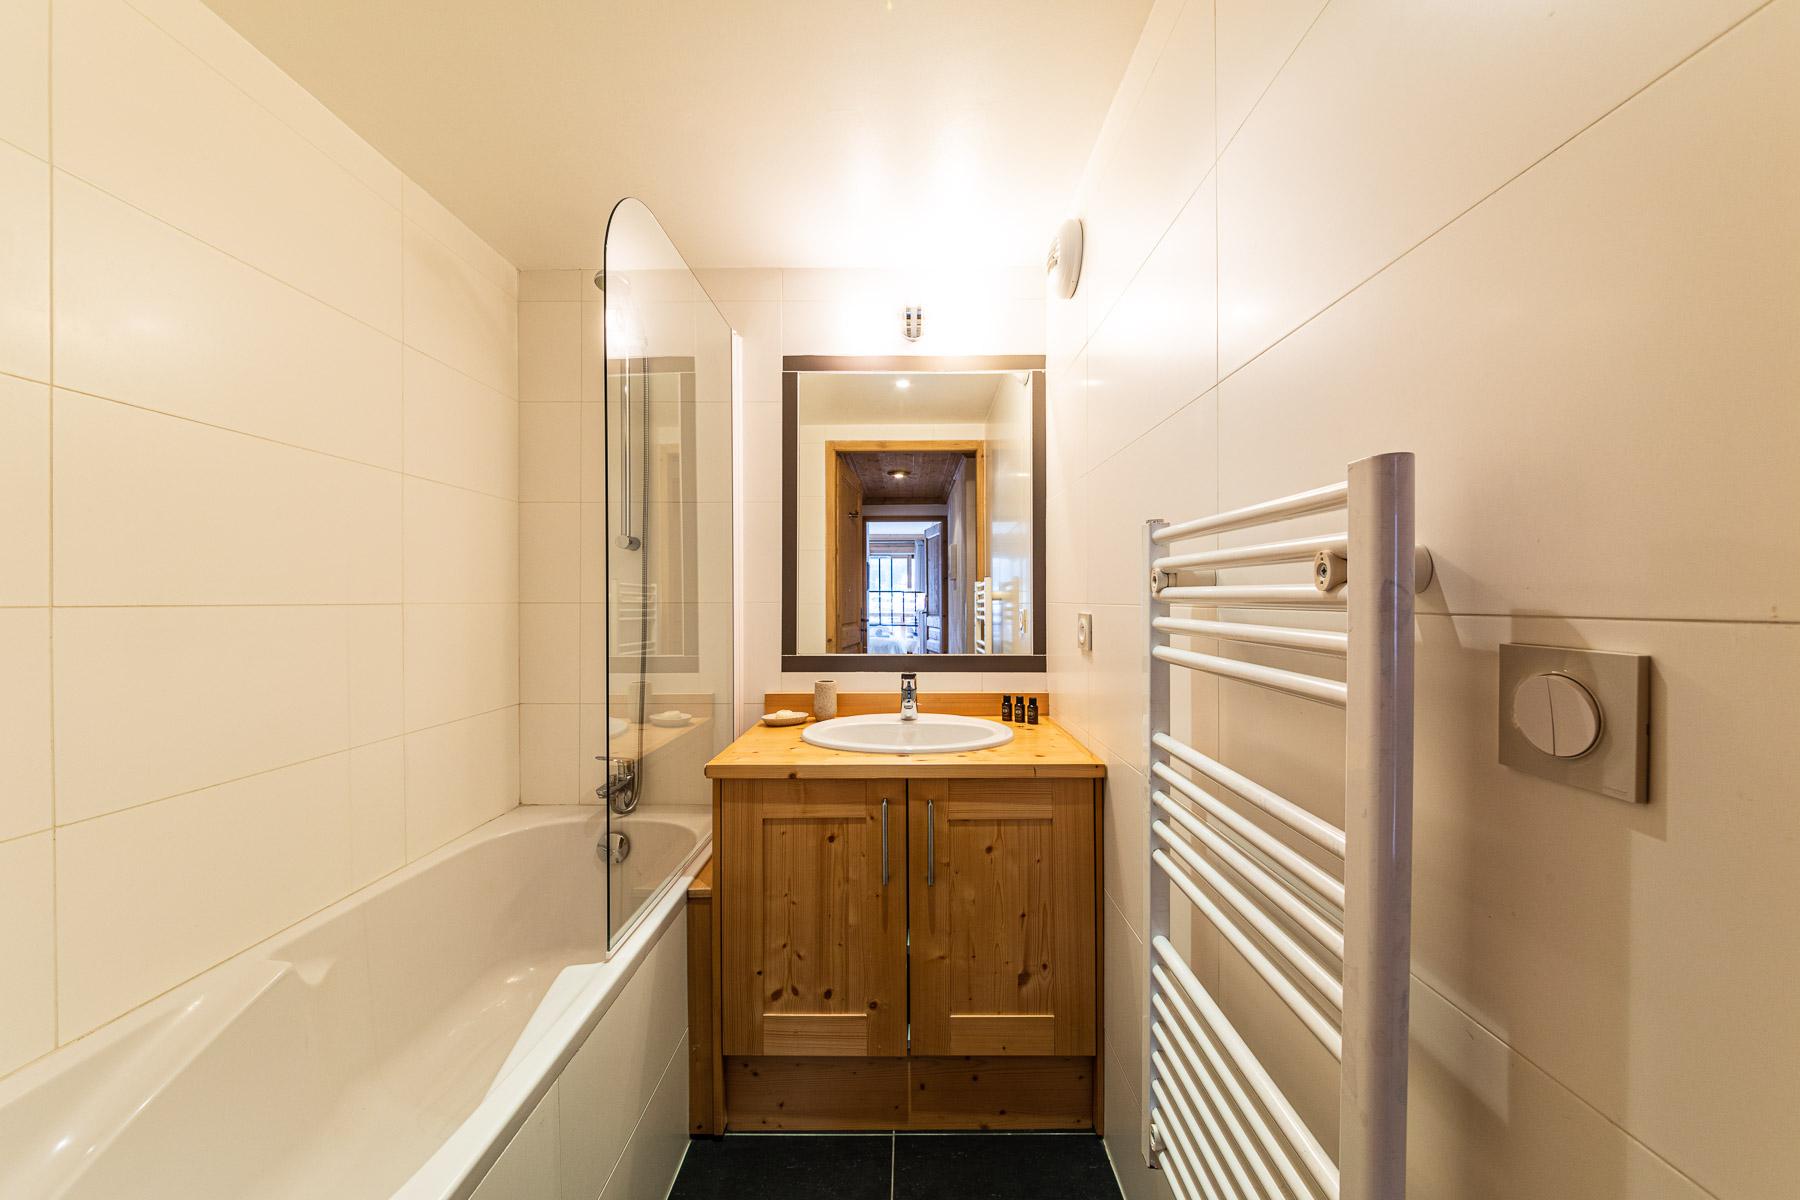 Bois Venants Appt 295 Bathroom